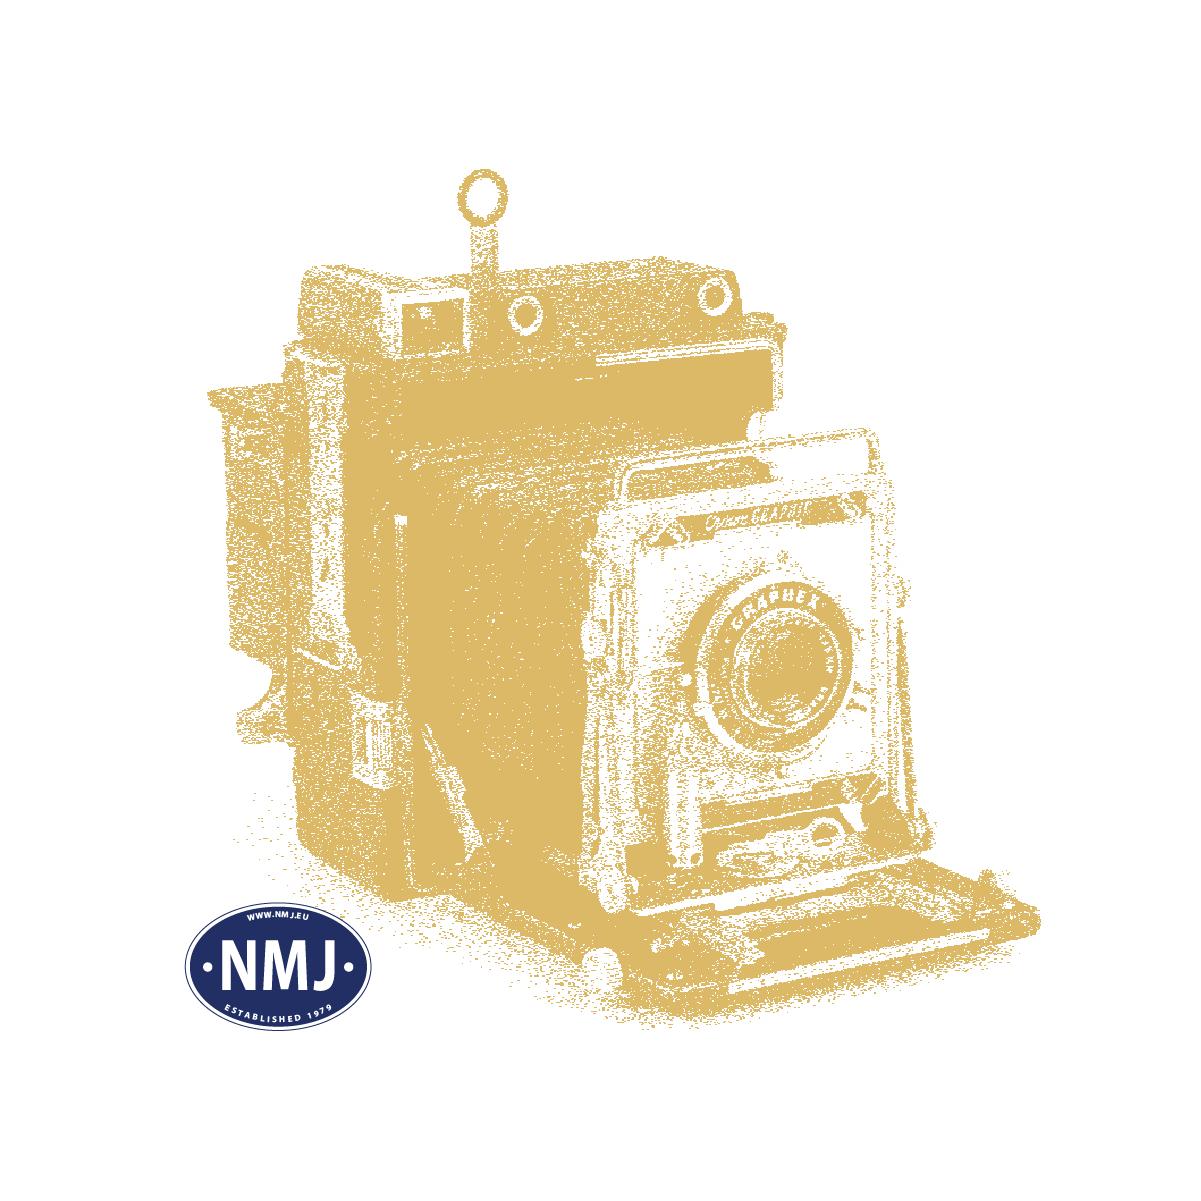 NMJSCOT5.3 - NMJ Superline Modell des Co type 5 der KFB/KB Messing Ausführung